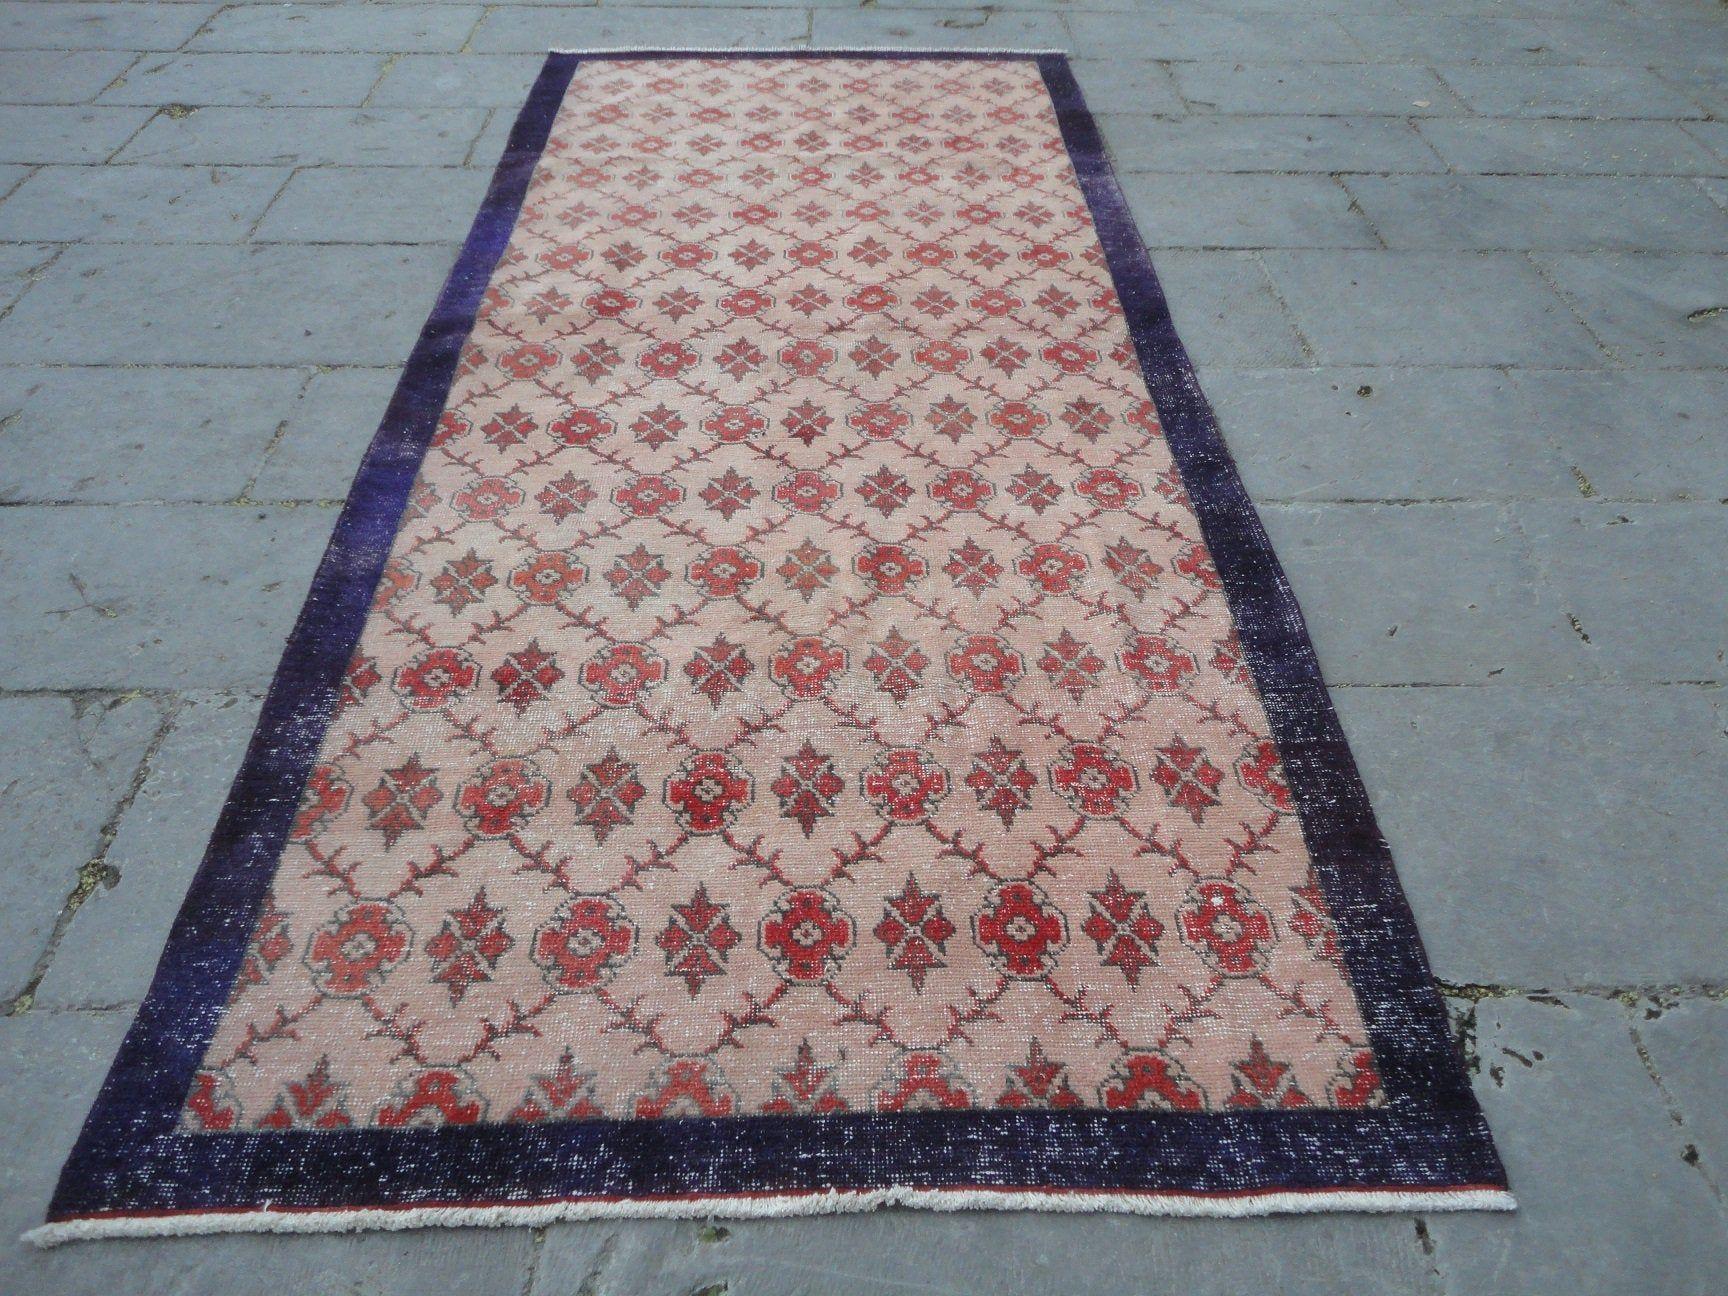 Red Runner RugBoho Low Pile Long CarpetVintage Area Rug 8 9 x 4 1 Wool Floor CarpetH Red Runner RugBoho Low Pile Long CarpetVintage Area Rug 8 9 x 4 1 Wool Floor CarpetHa...